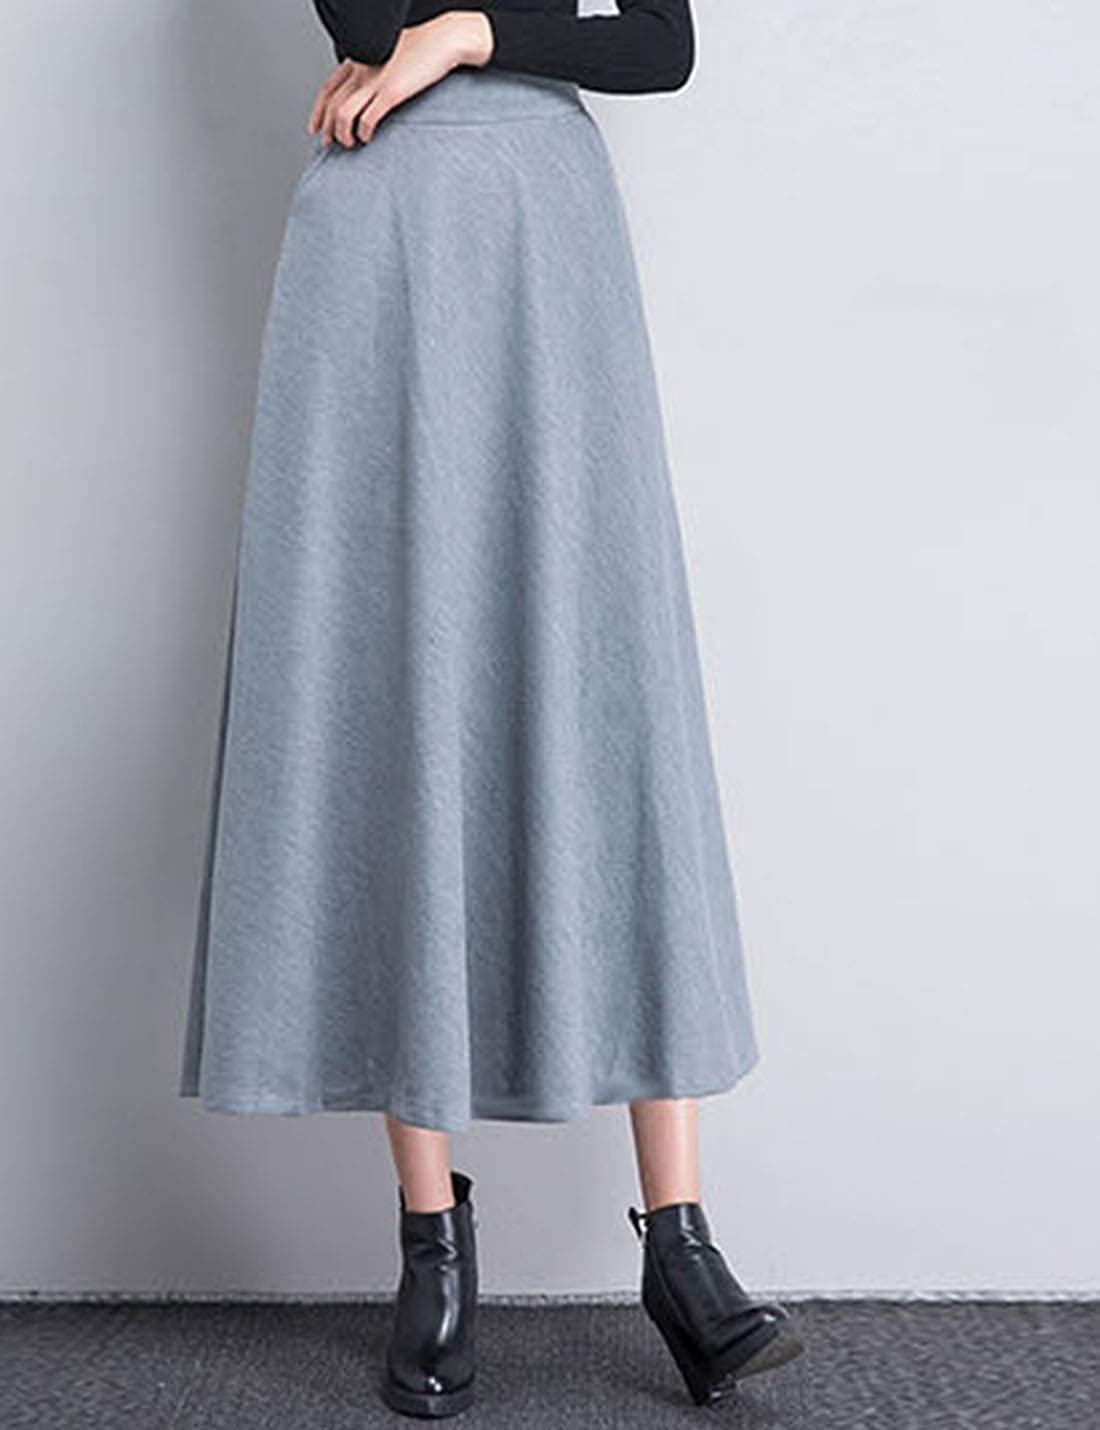 Lentta Womens Casual High Waist A-Line Midi Wool Blend Pleated Flared Swing Skirts